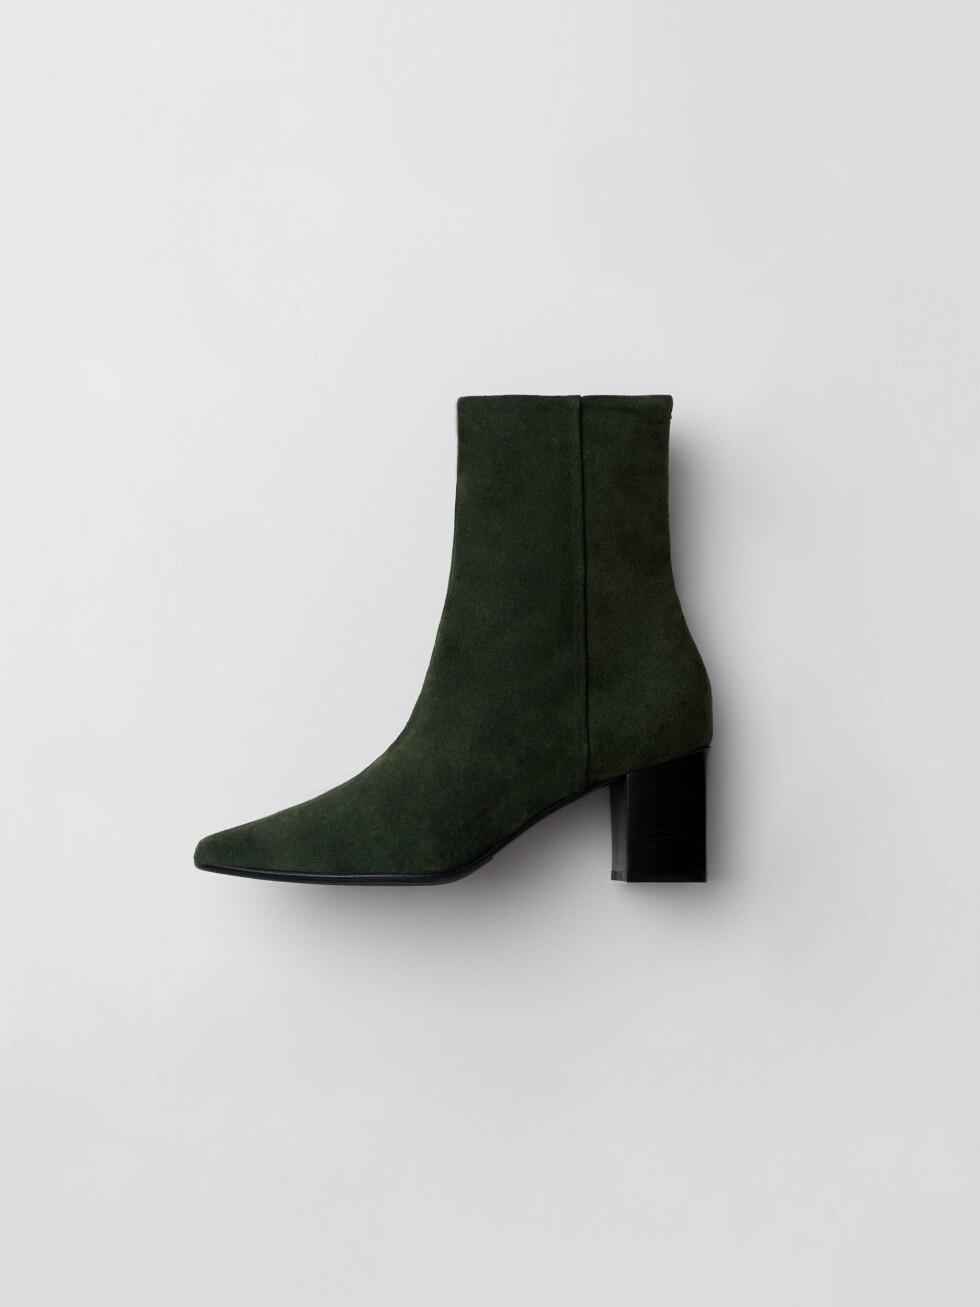 Grønn fra Aeyde |2600,-| https://www.aeyde.com/products/boris-forest-suede